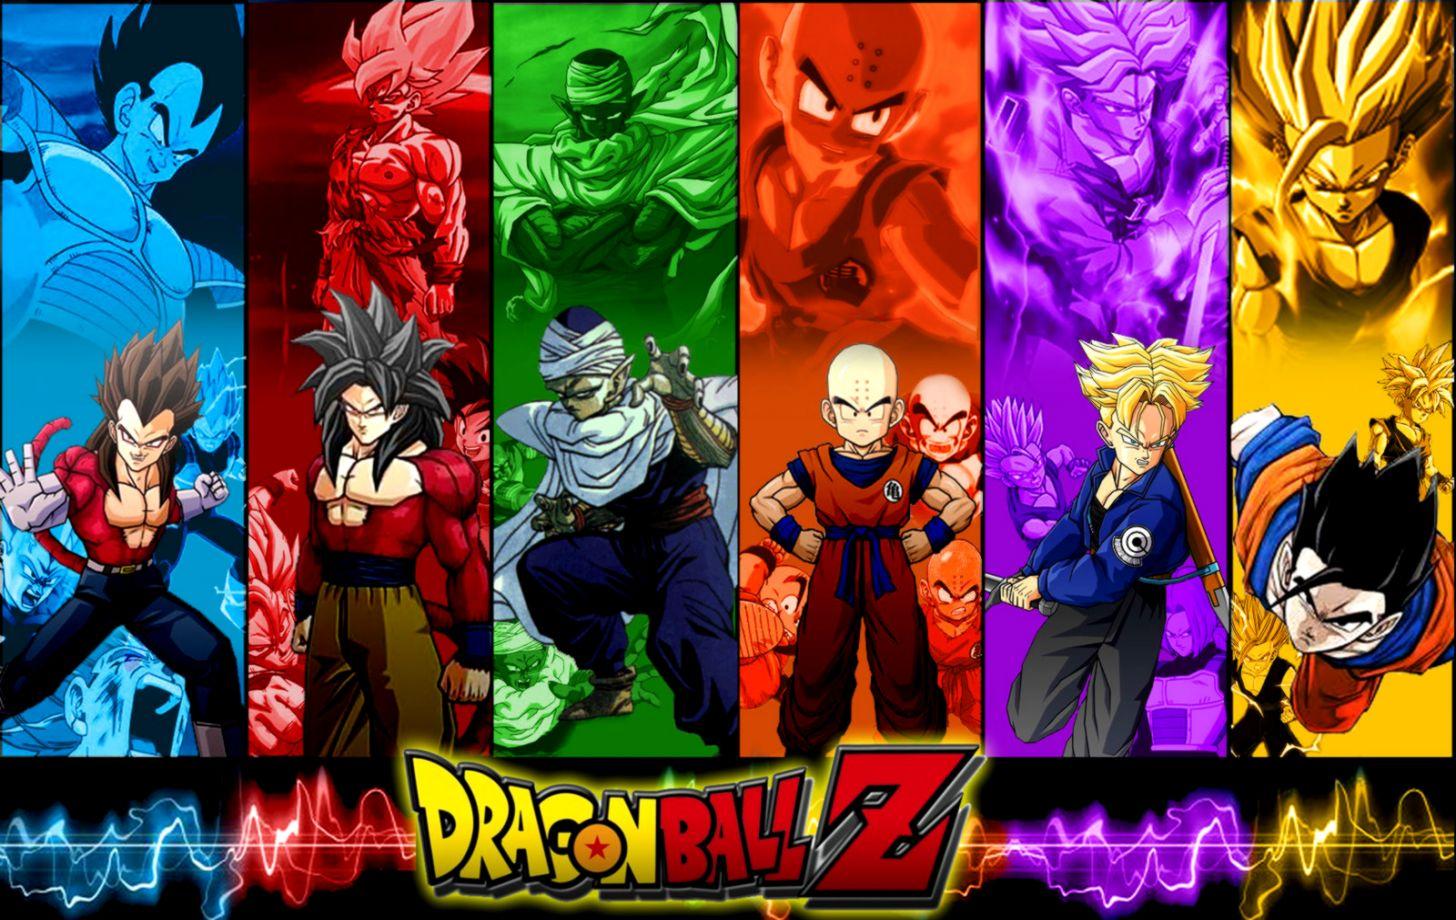 Dragon Ball Z Wallpaper Themes Hd Nababan Wallpapers